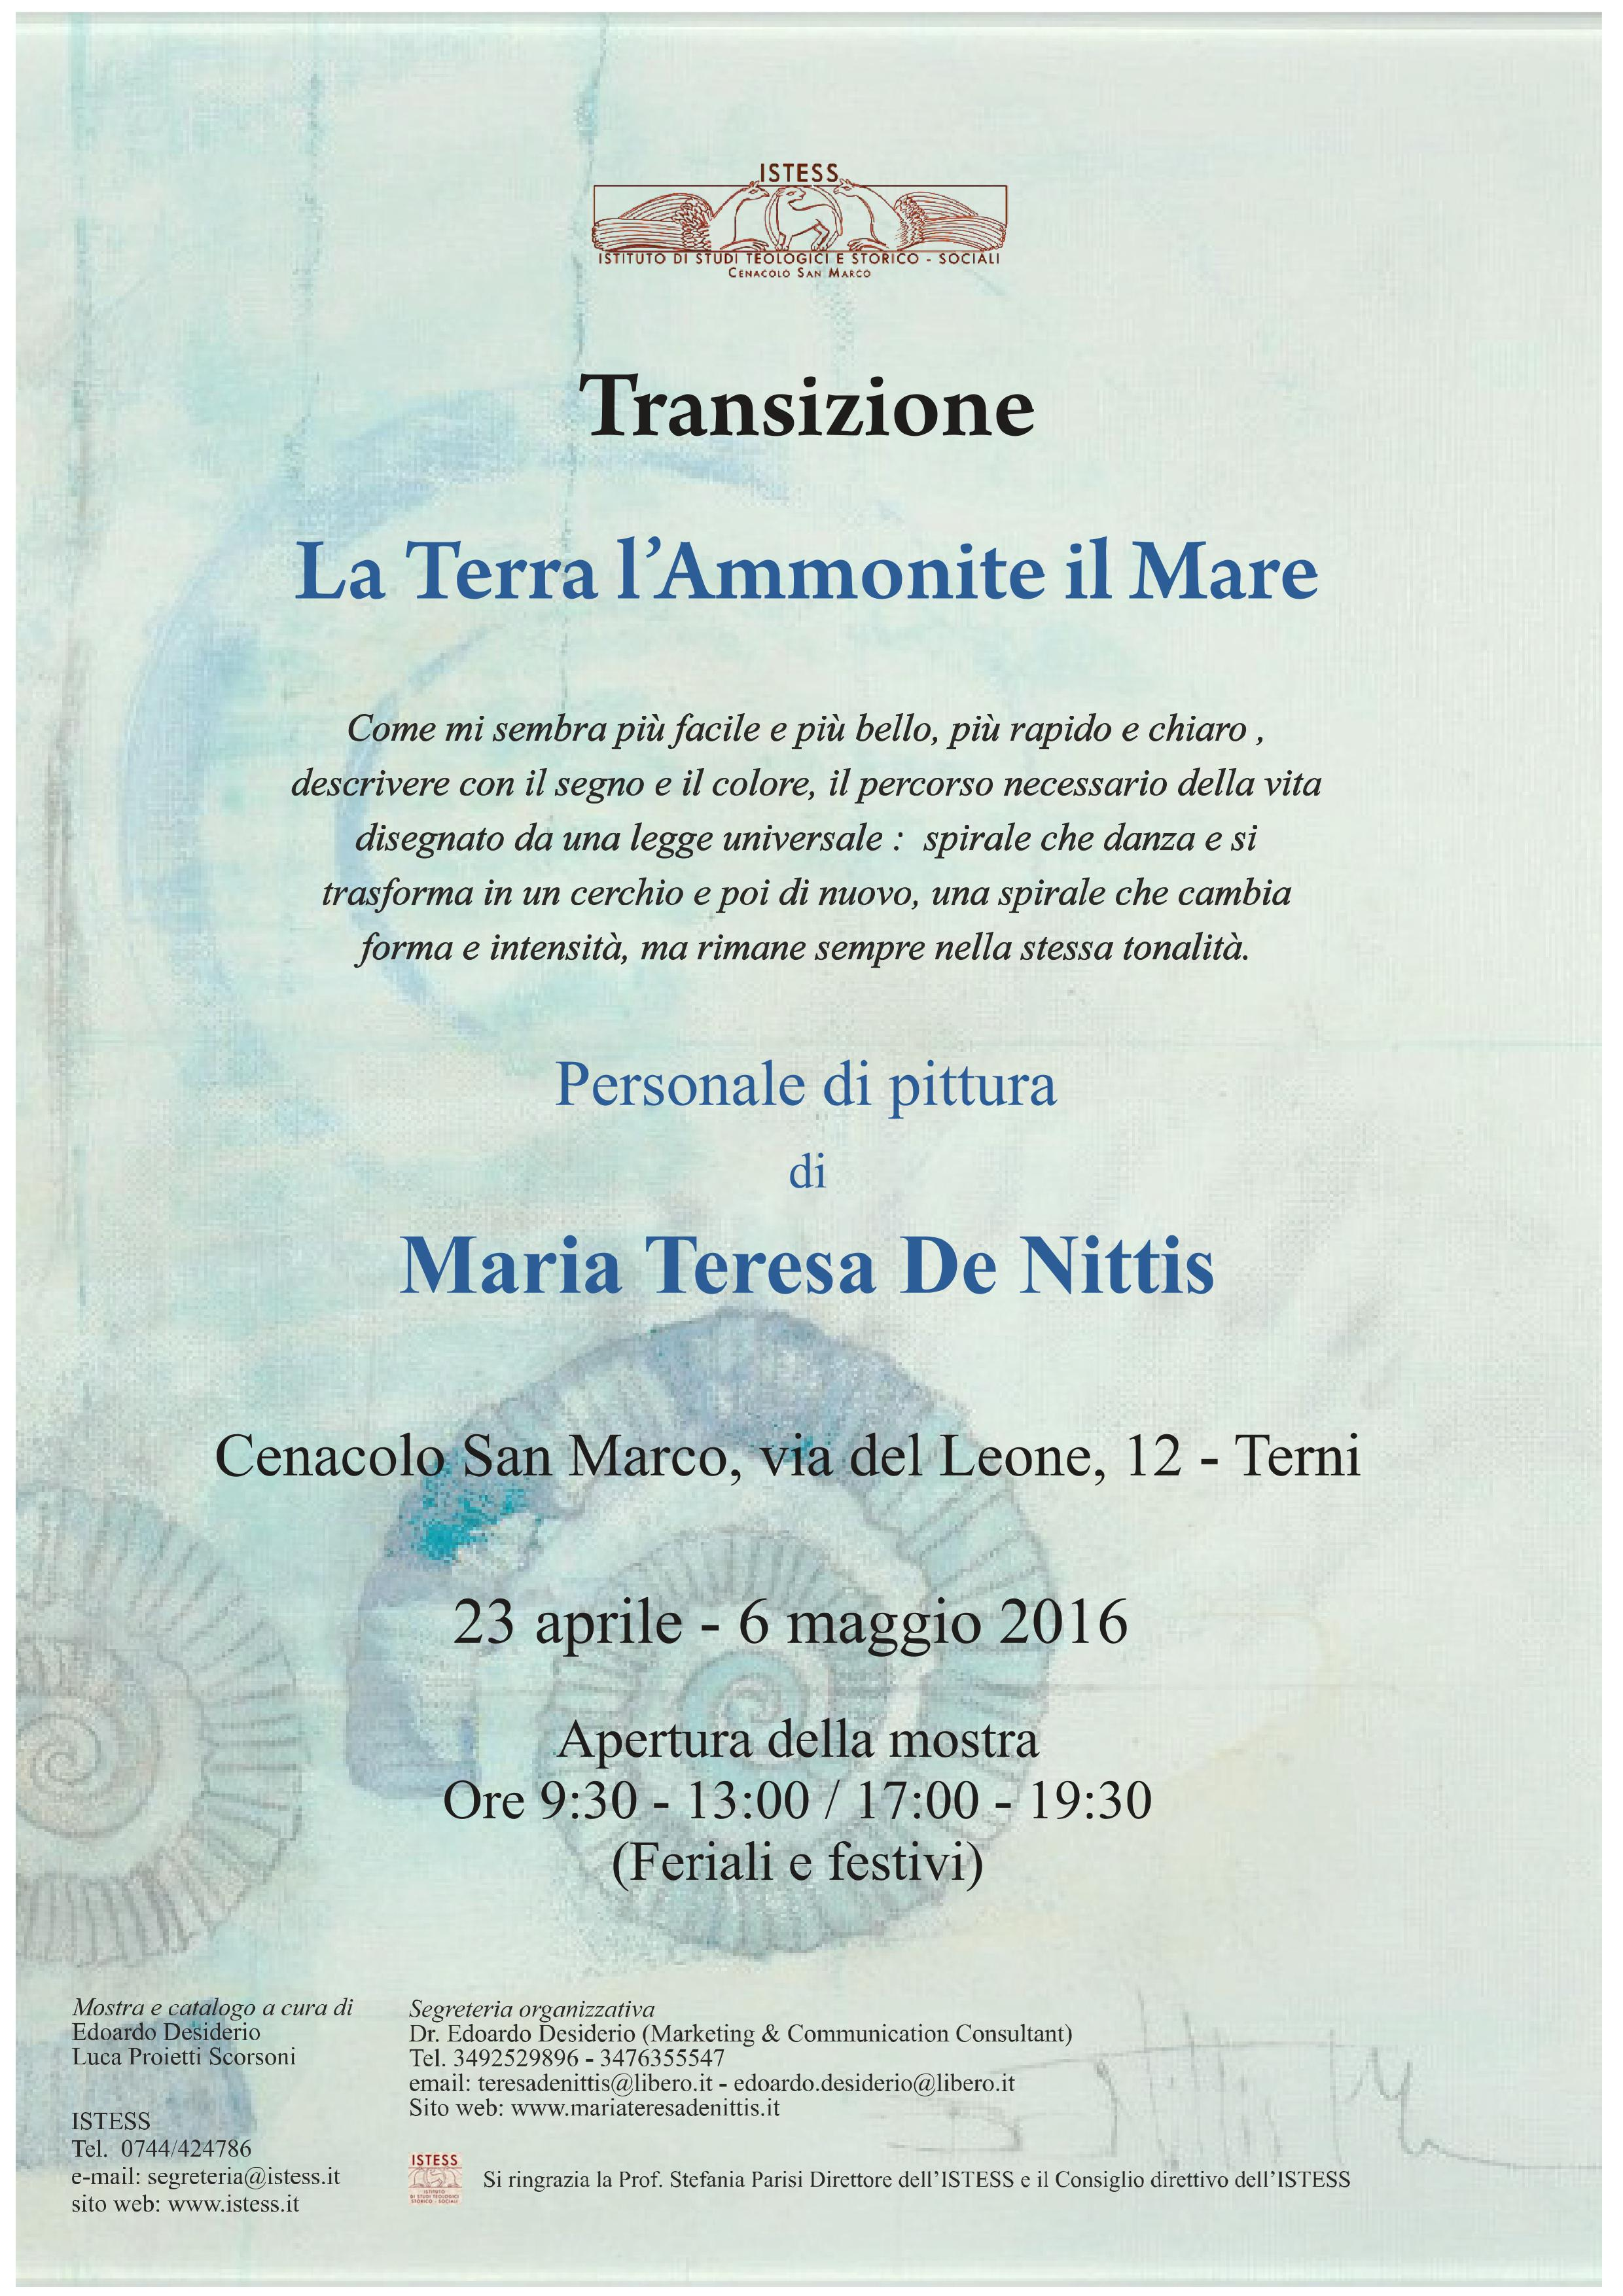 Locandina_Mostra_De_Nittis